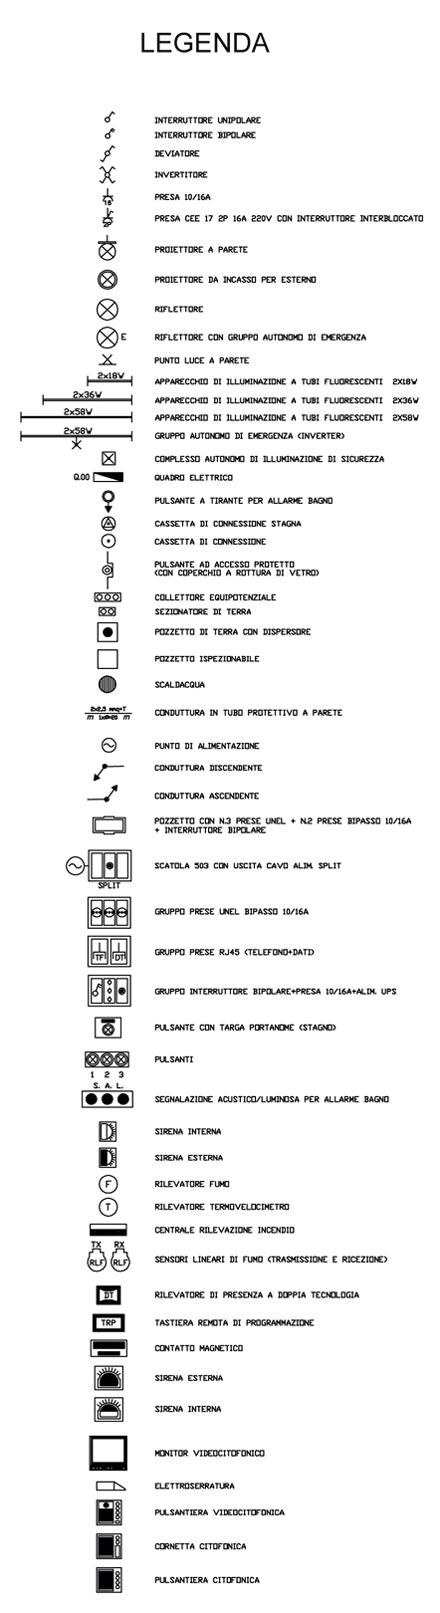 Simboli elettrici dwg - simboli impianto elettrico | Business ...